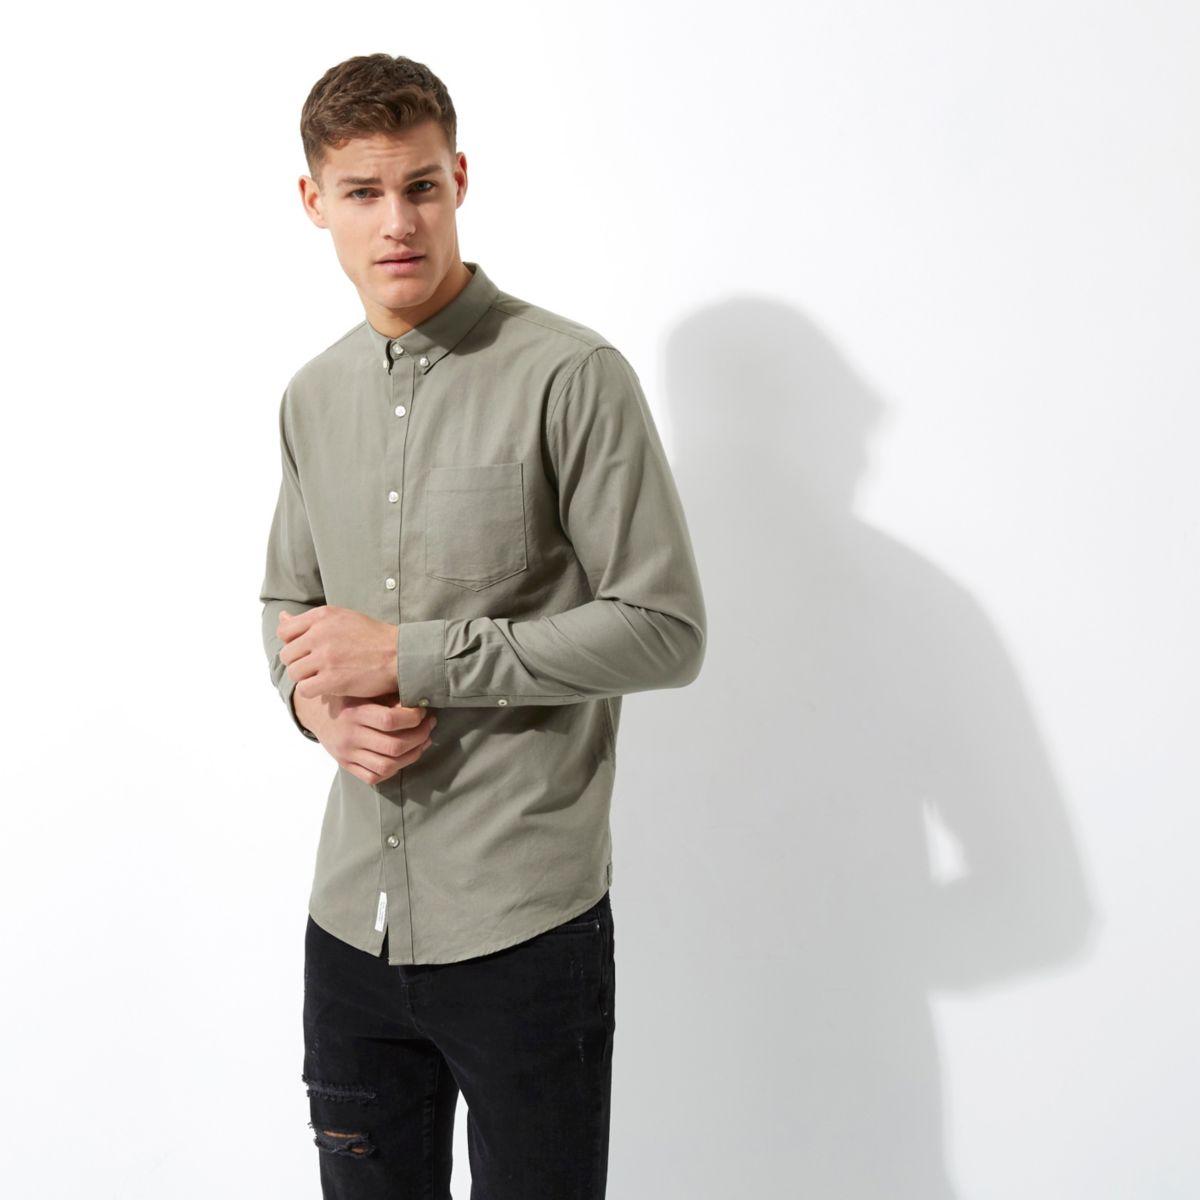 Khaki green casual Oxford shirt